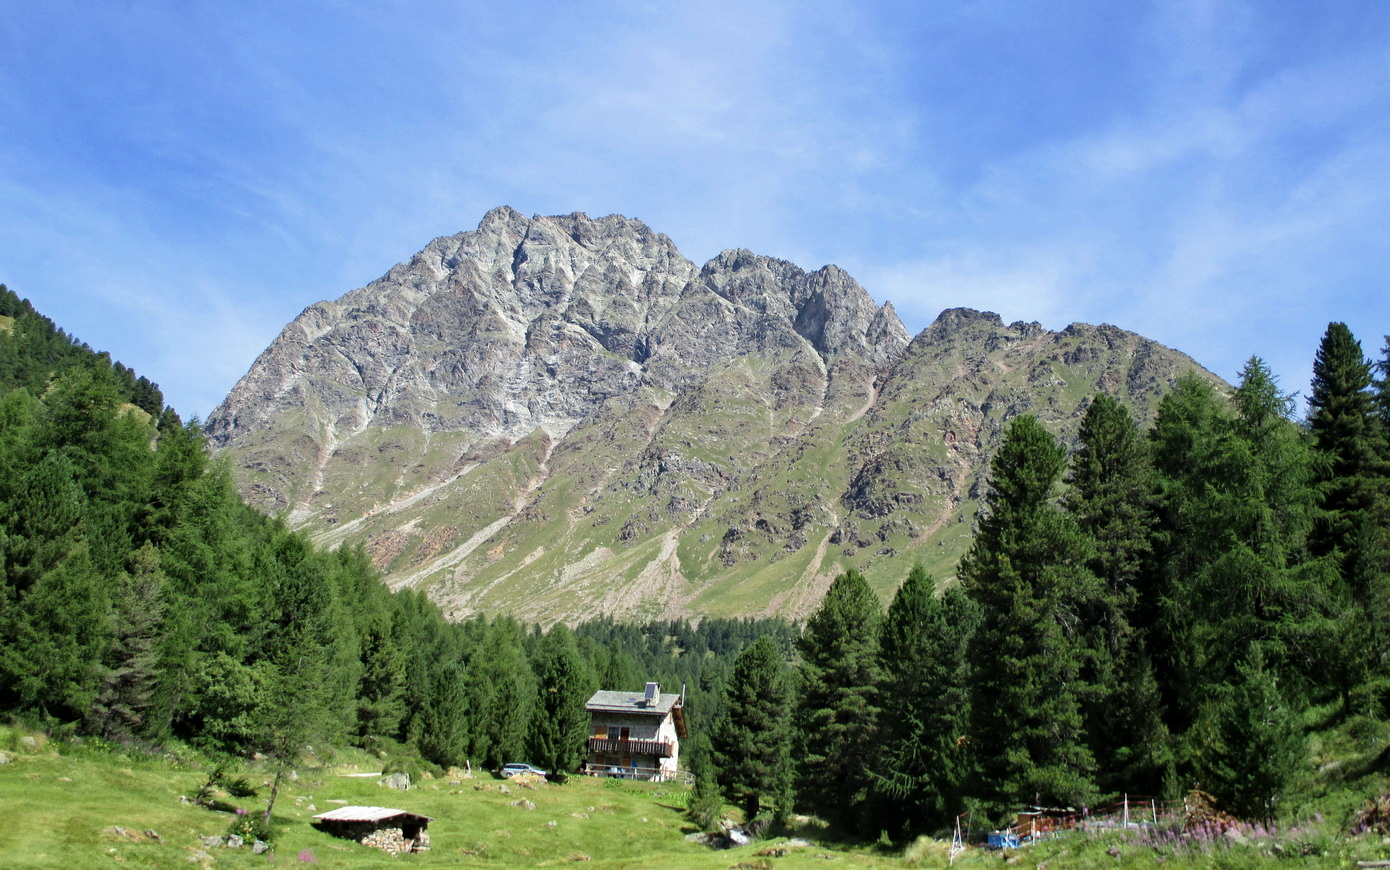 corn-da-camp-3232m-solo-aber-free-vychodnym-hrebenom